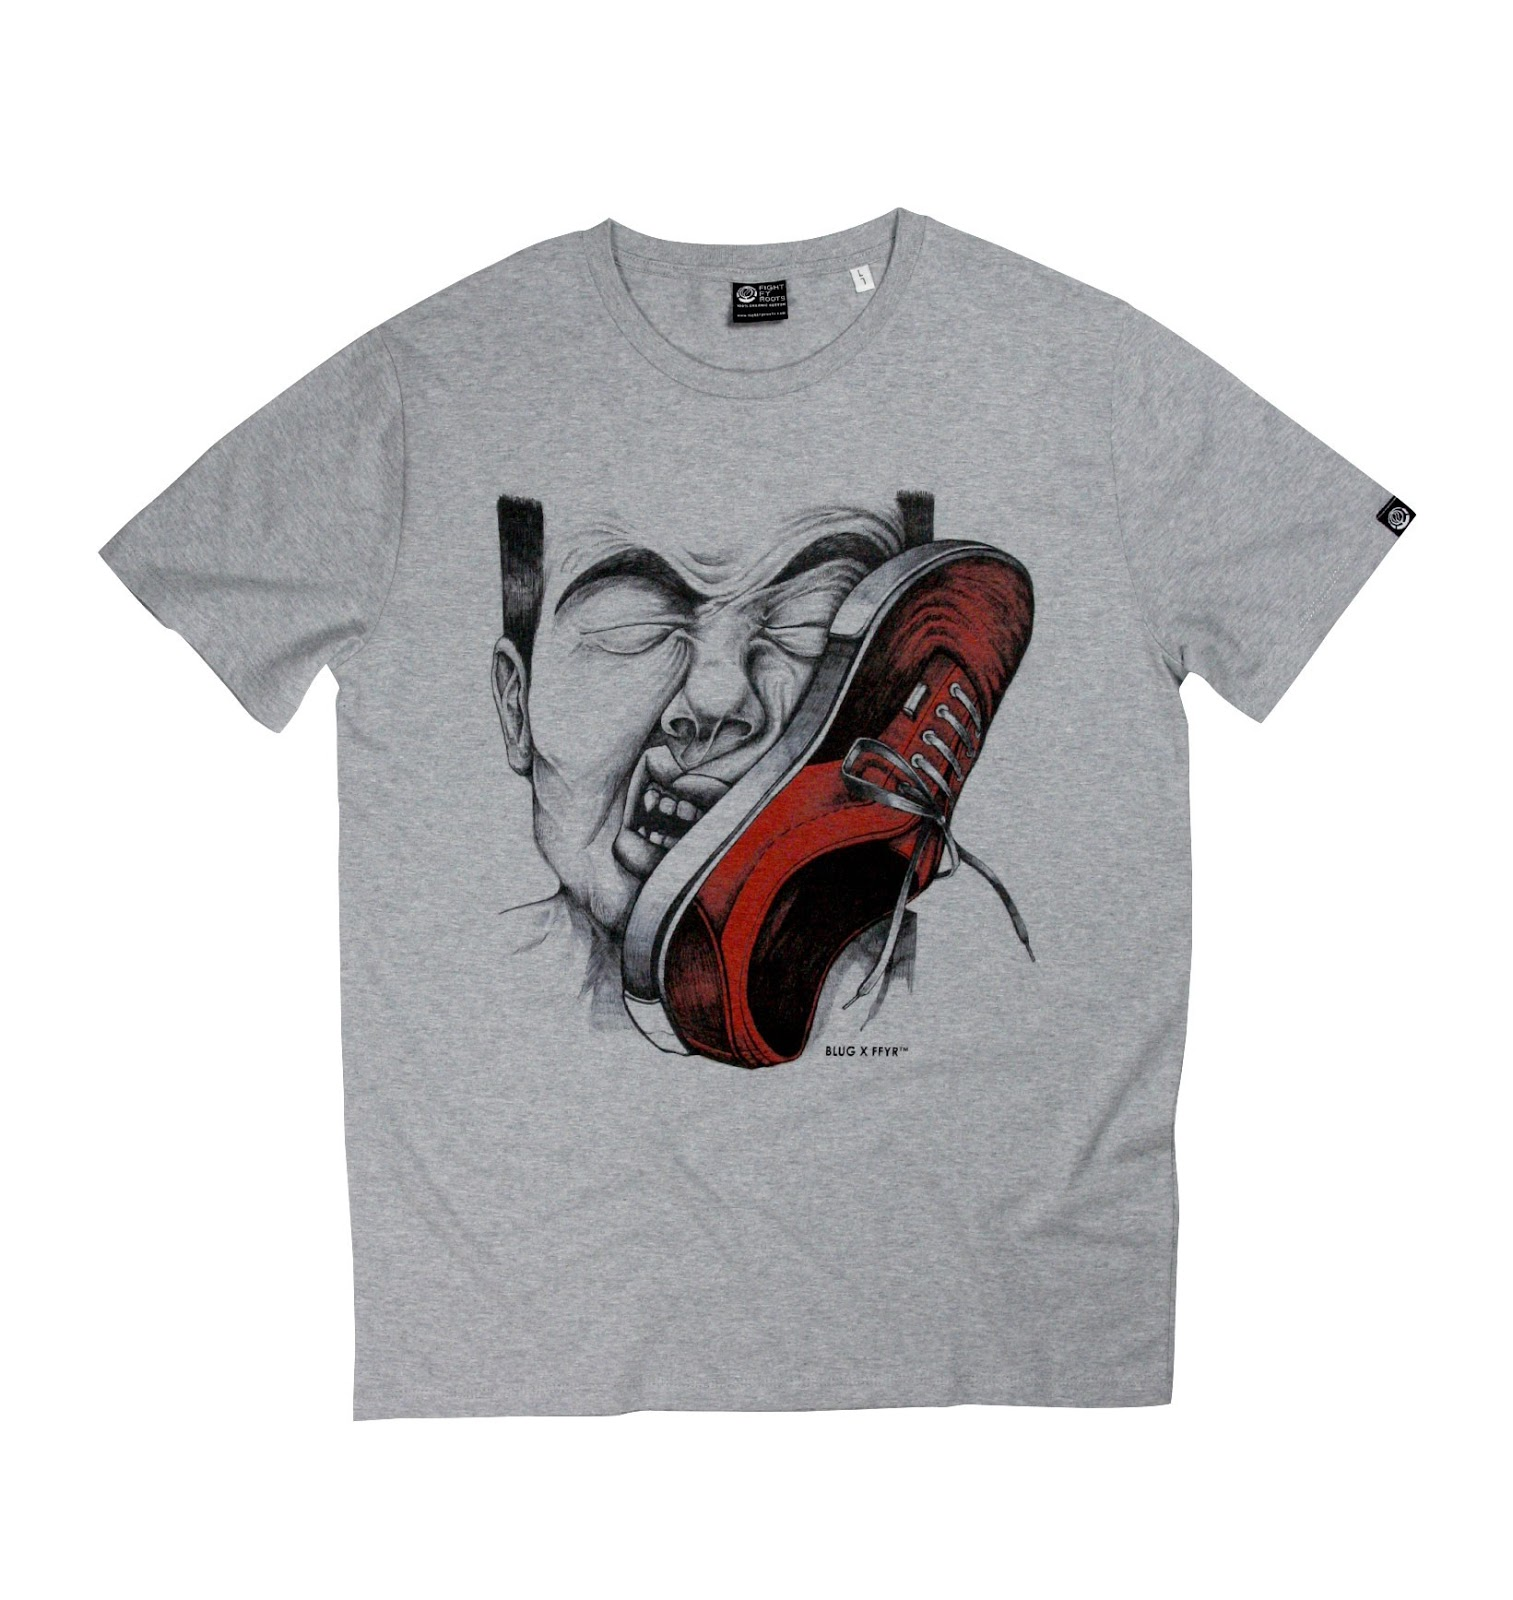 https://grafitee.es/s/camisetas/286-t-shirt-as-a-slap.html